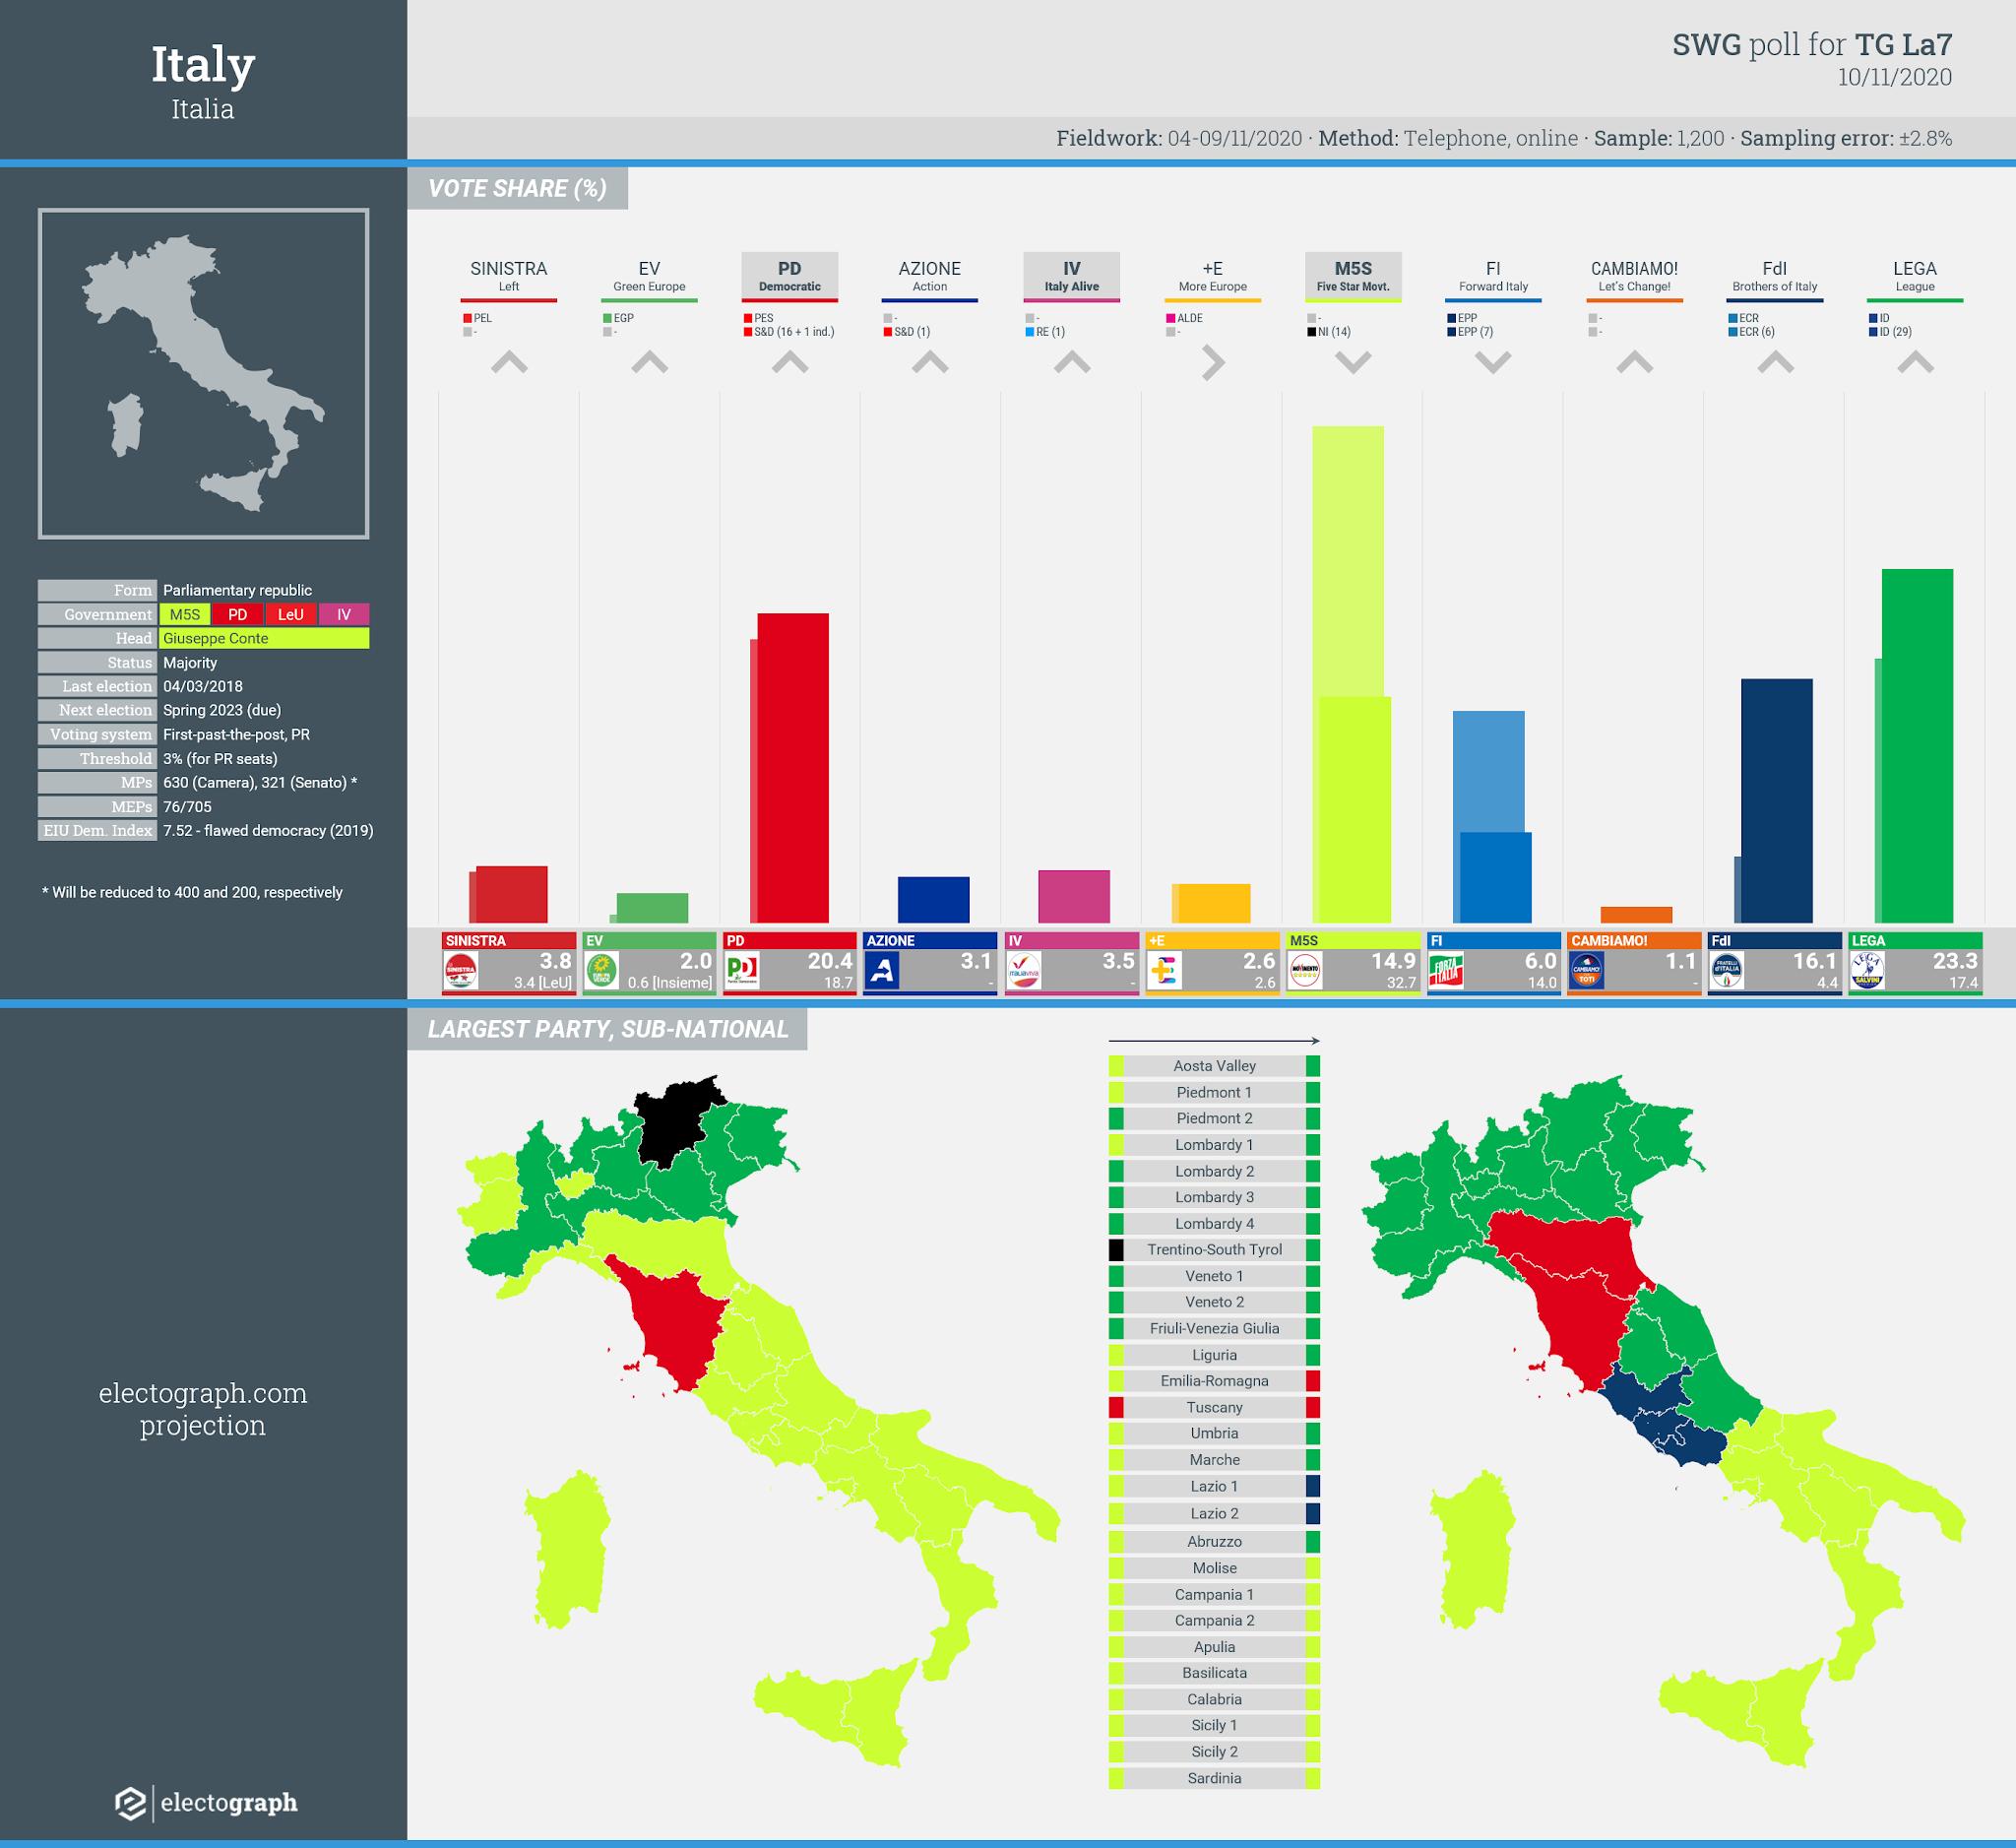 ITALY: SWG poll chart for TG La7, 10 November 2020